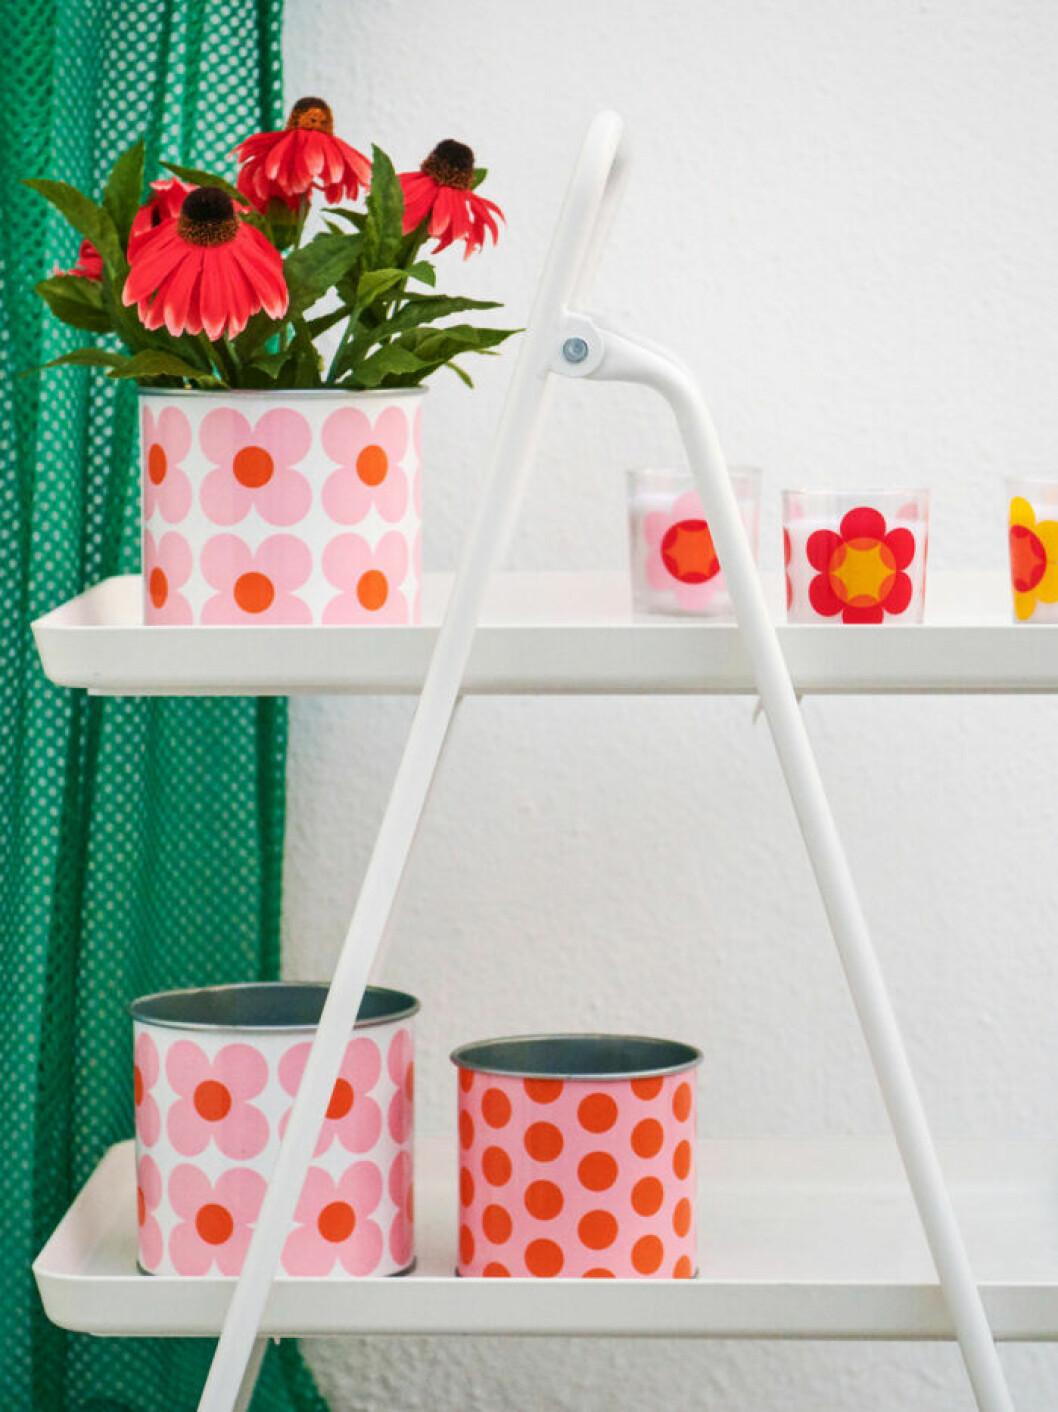 Ikea sommar 2019 retro blomkruka